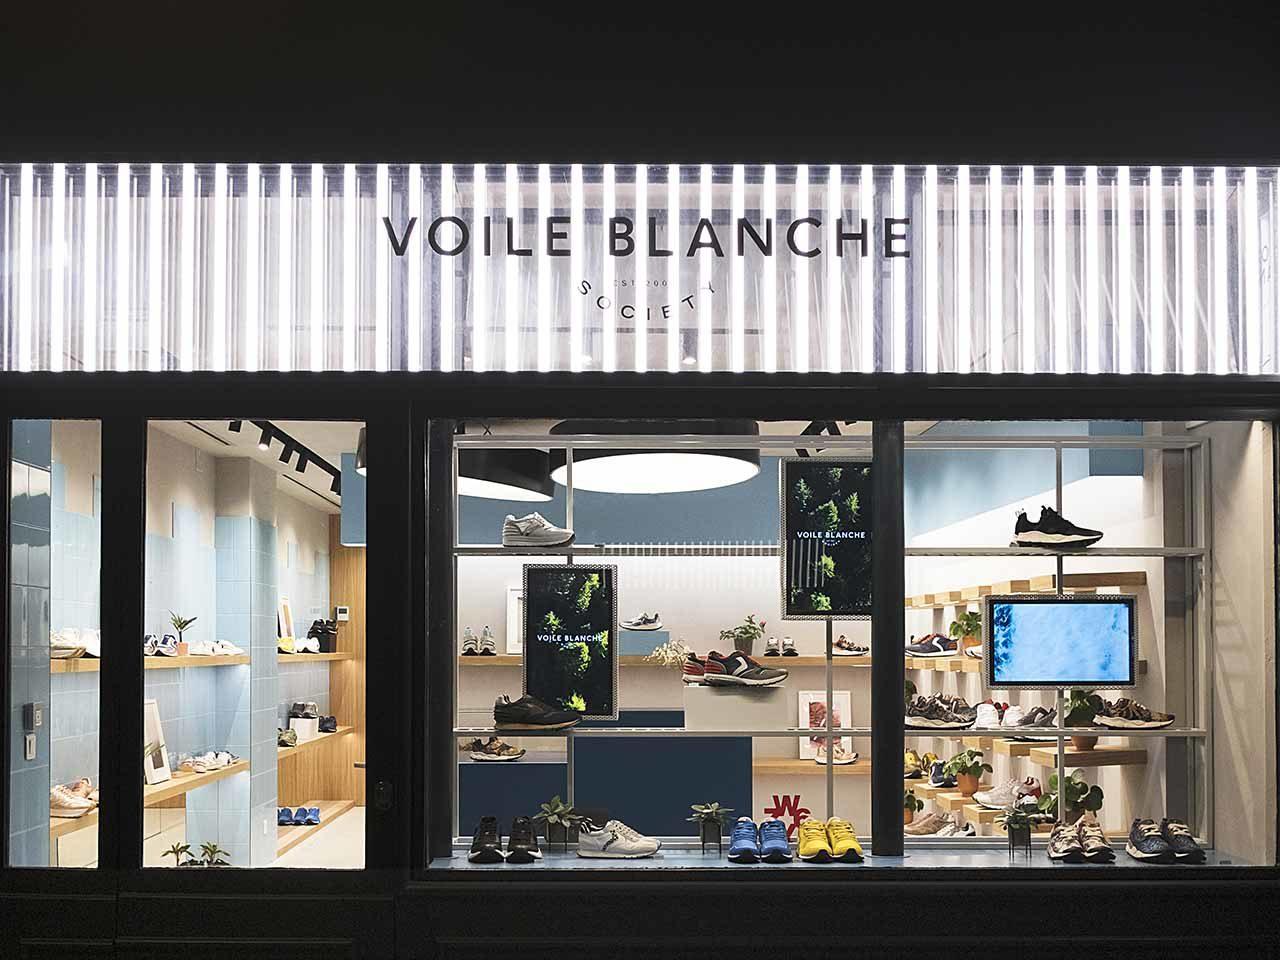 Voile-Blanche-Society-Paris-(1)